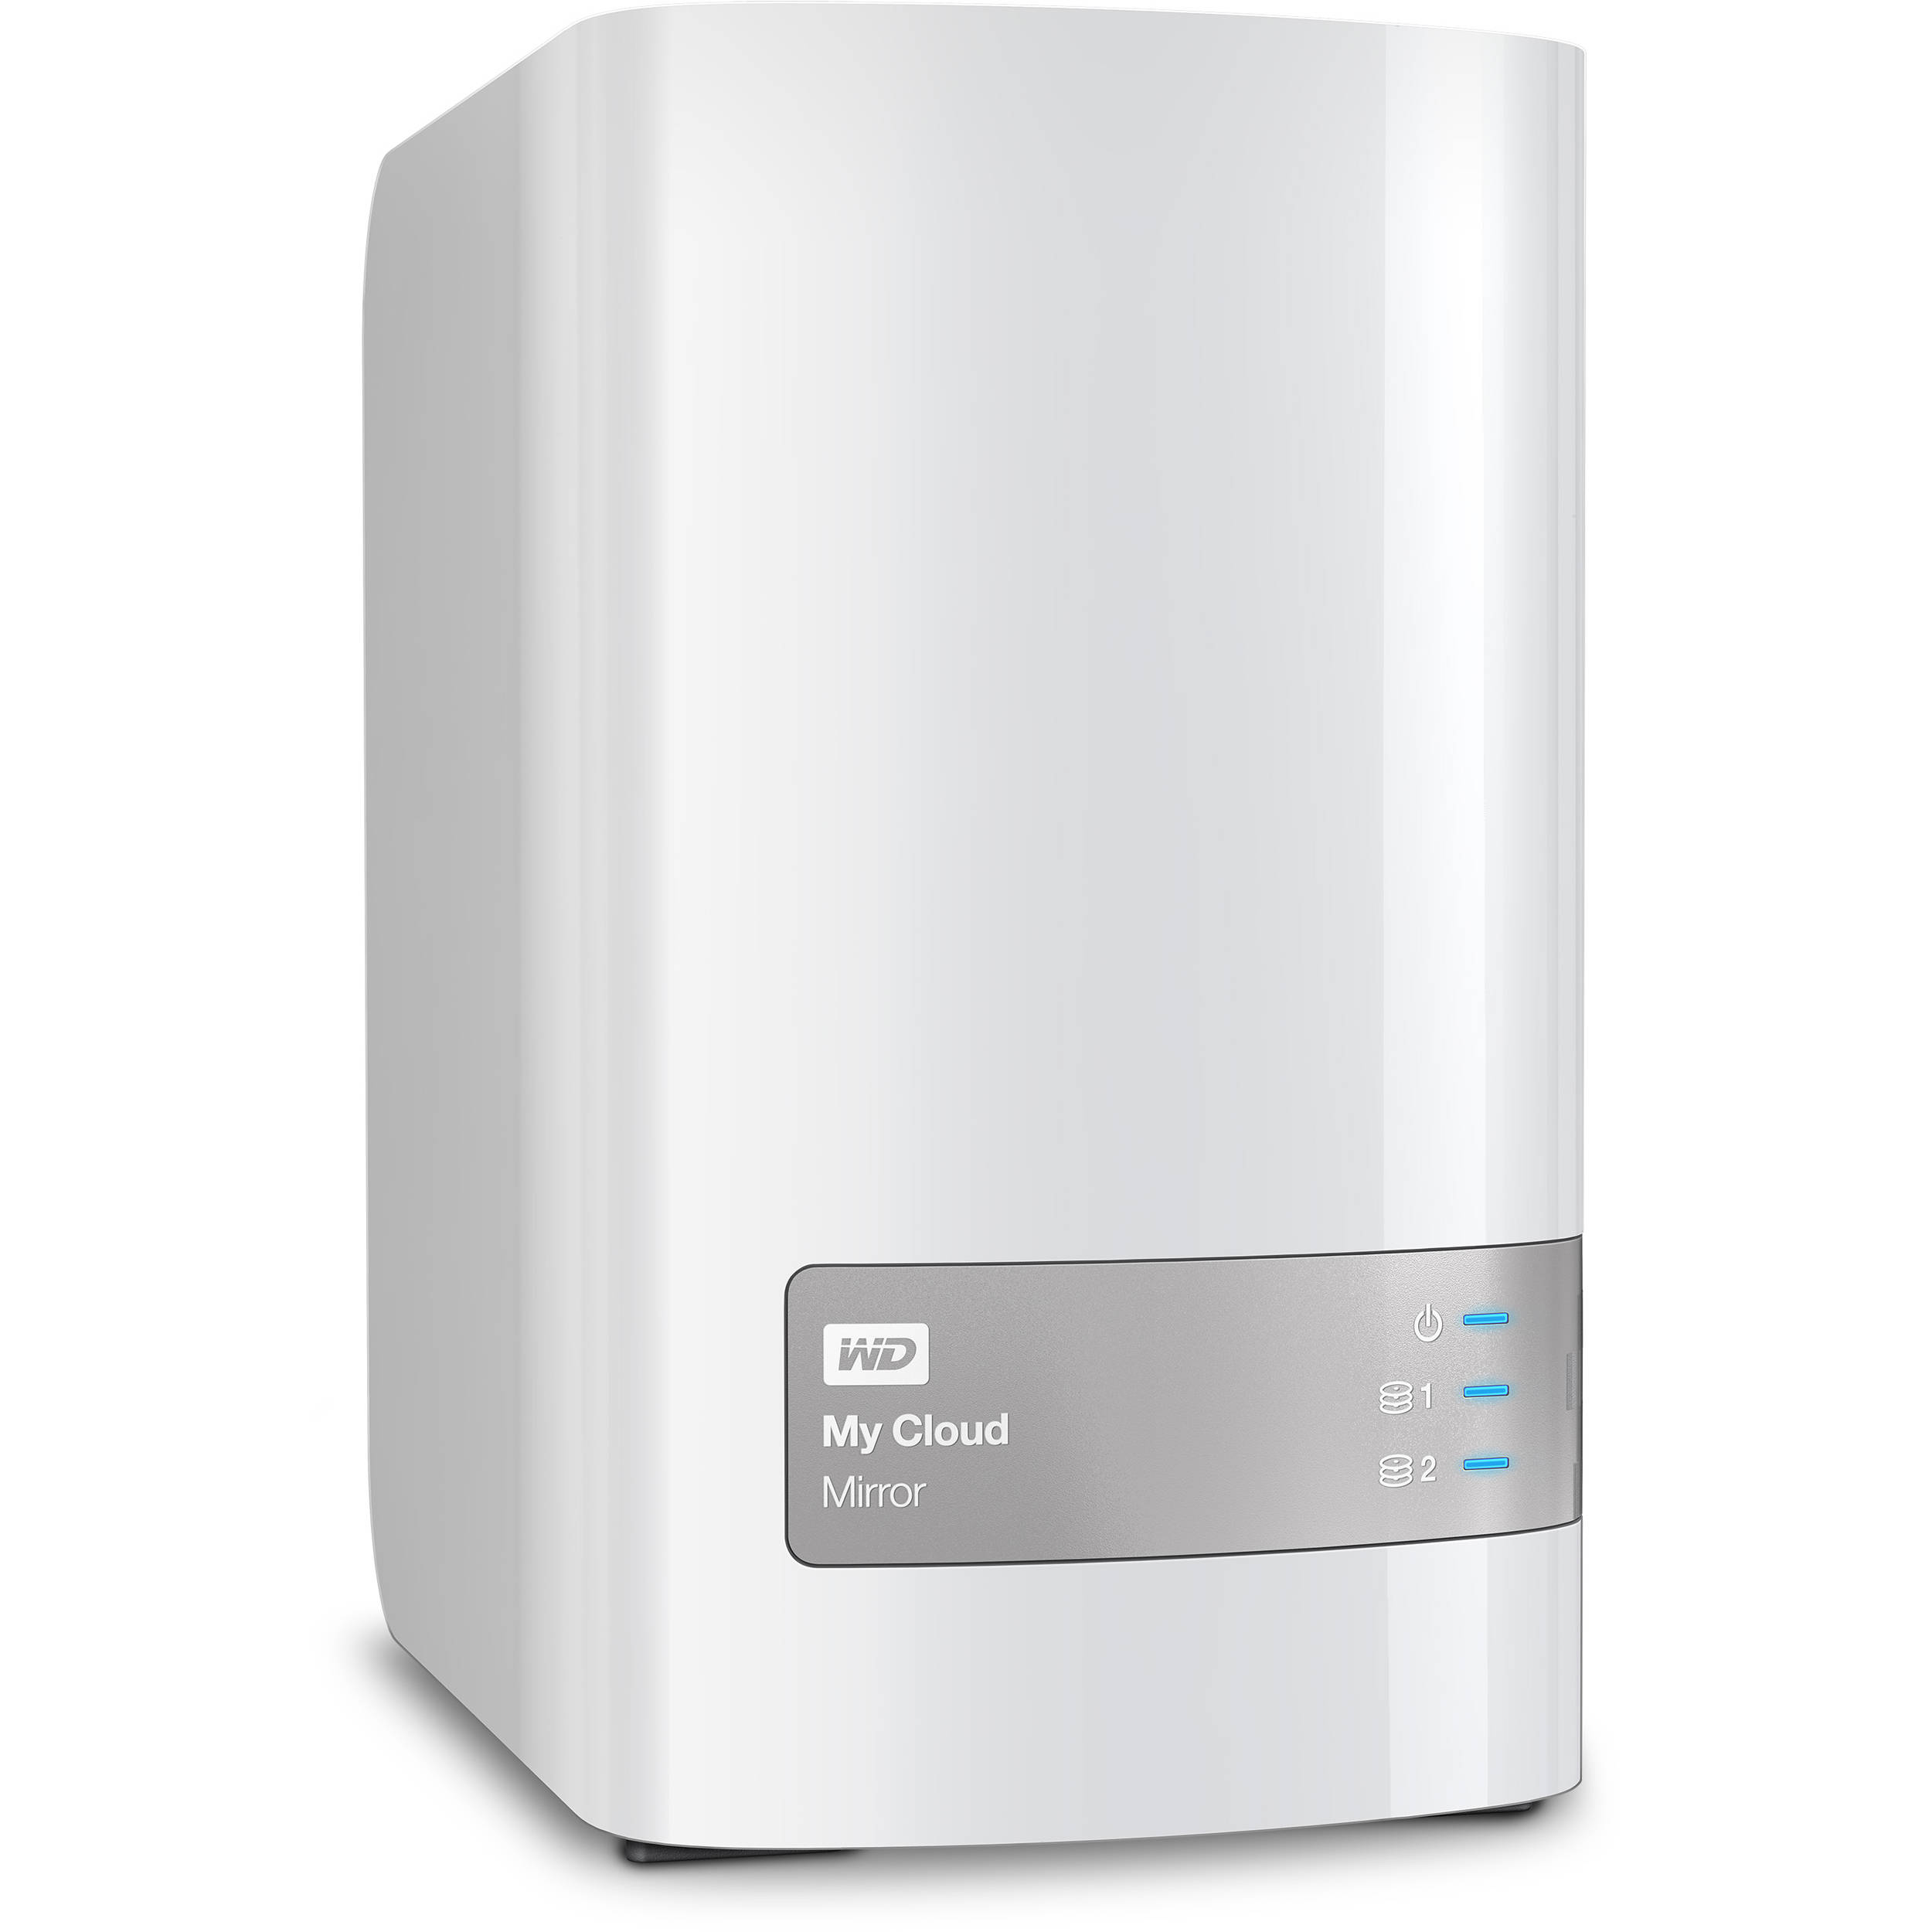 WD My Cloud Mirror (Gen 2) 6TB 2-Bay NAS Server (2 x 3TB)